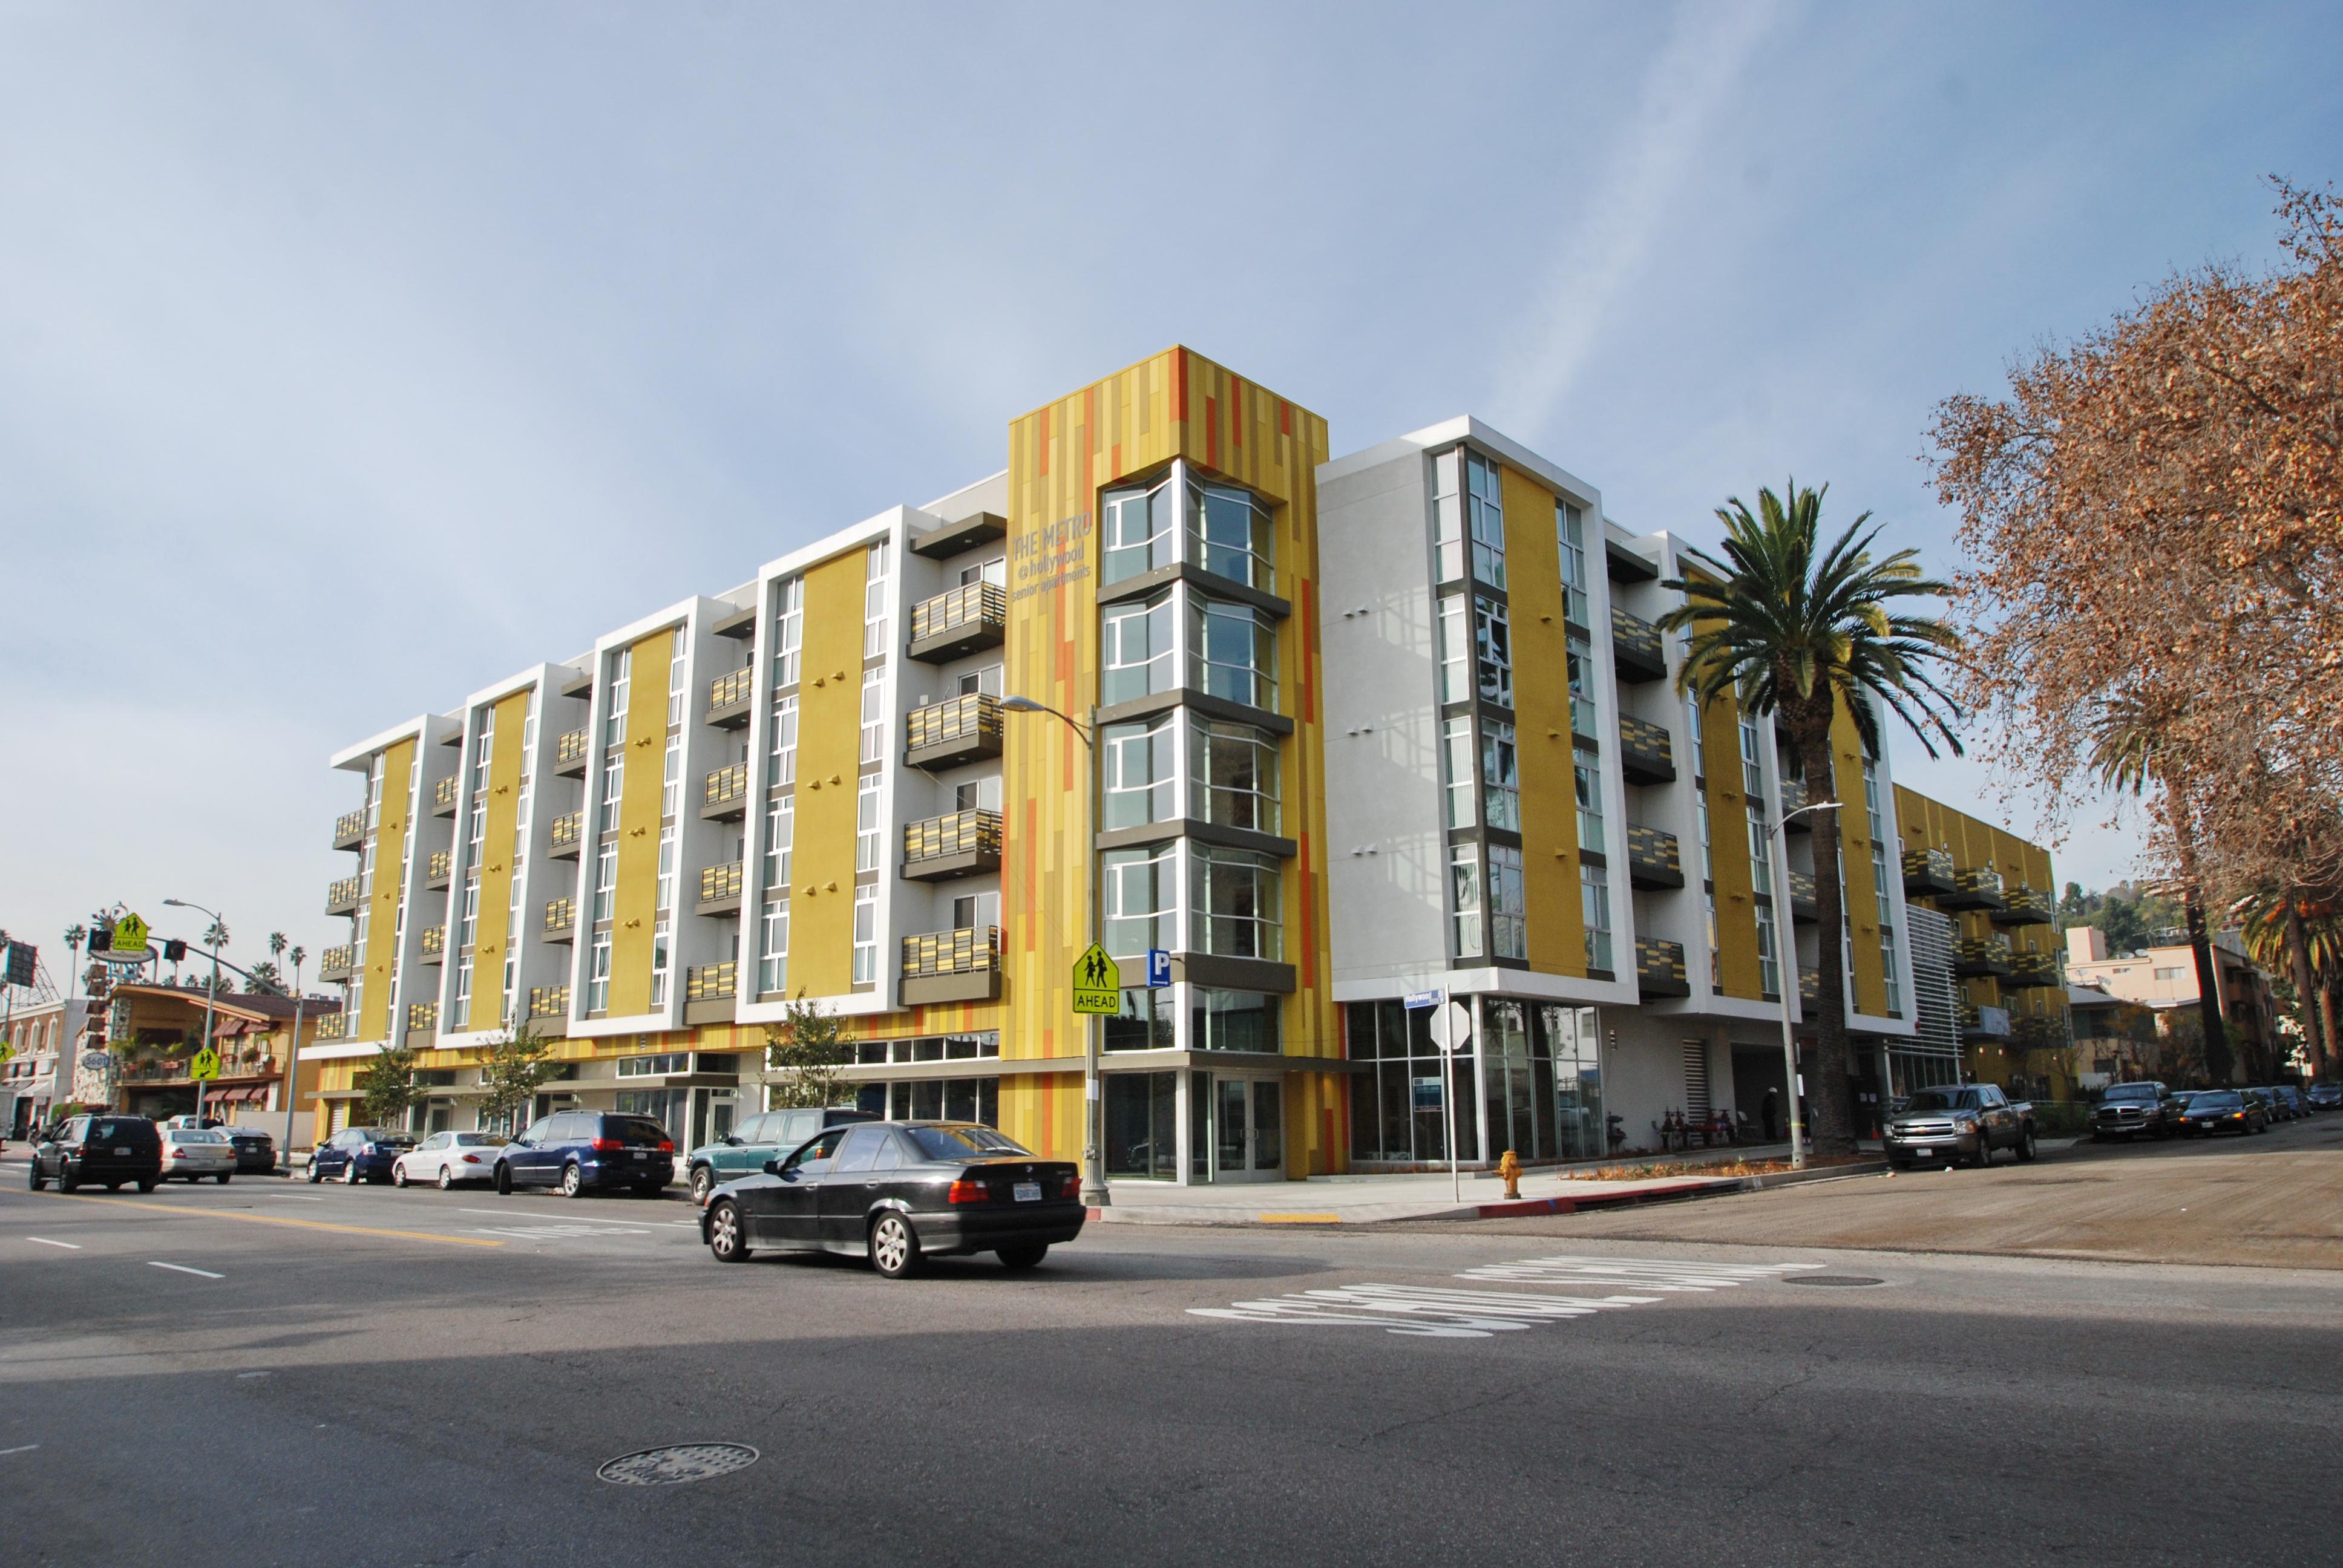 Senior Housing In The Twice City